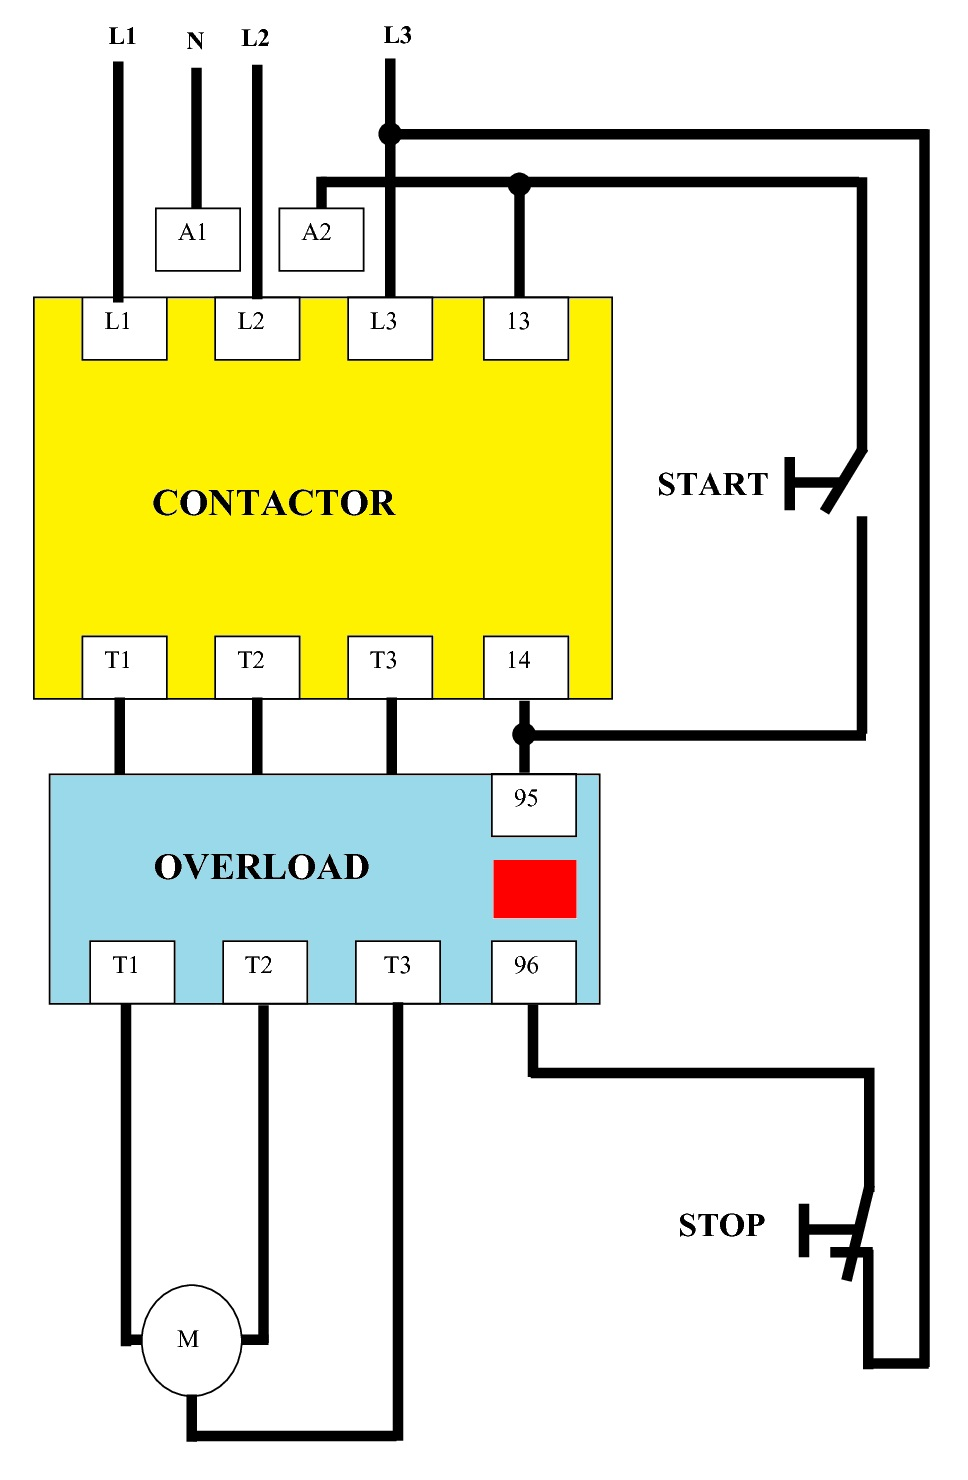 rg11 wiring diagrams smart car diagrams sincgars radio simple wiring diagrams perfect home electrical diagram [ 968 x 1480 Pixel ]